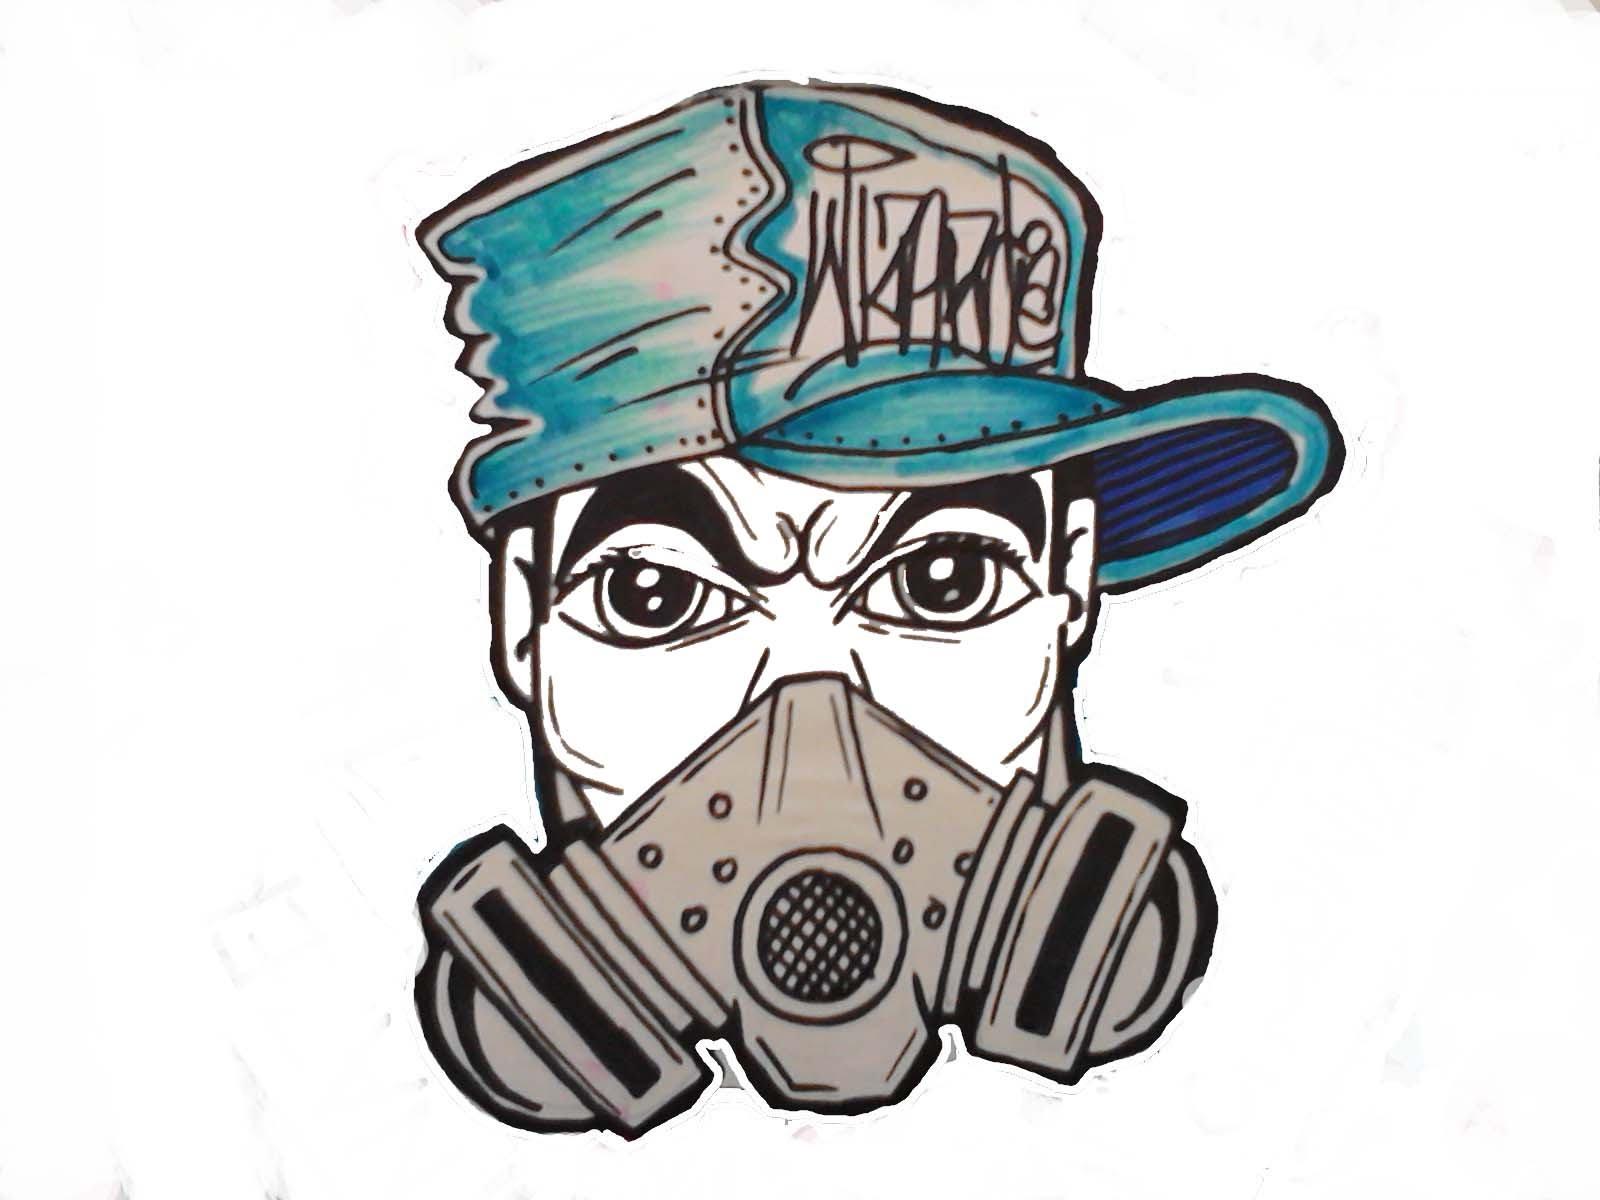 1600x1200 Graffiti Hip Hop Drawing To Pencil Drawing A Gas Mask Character